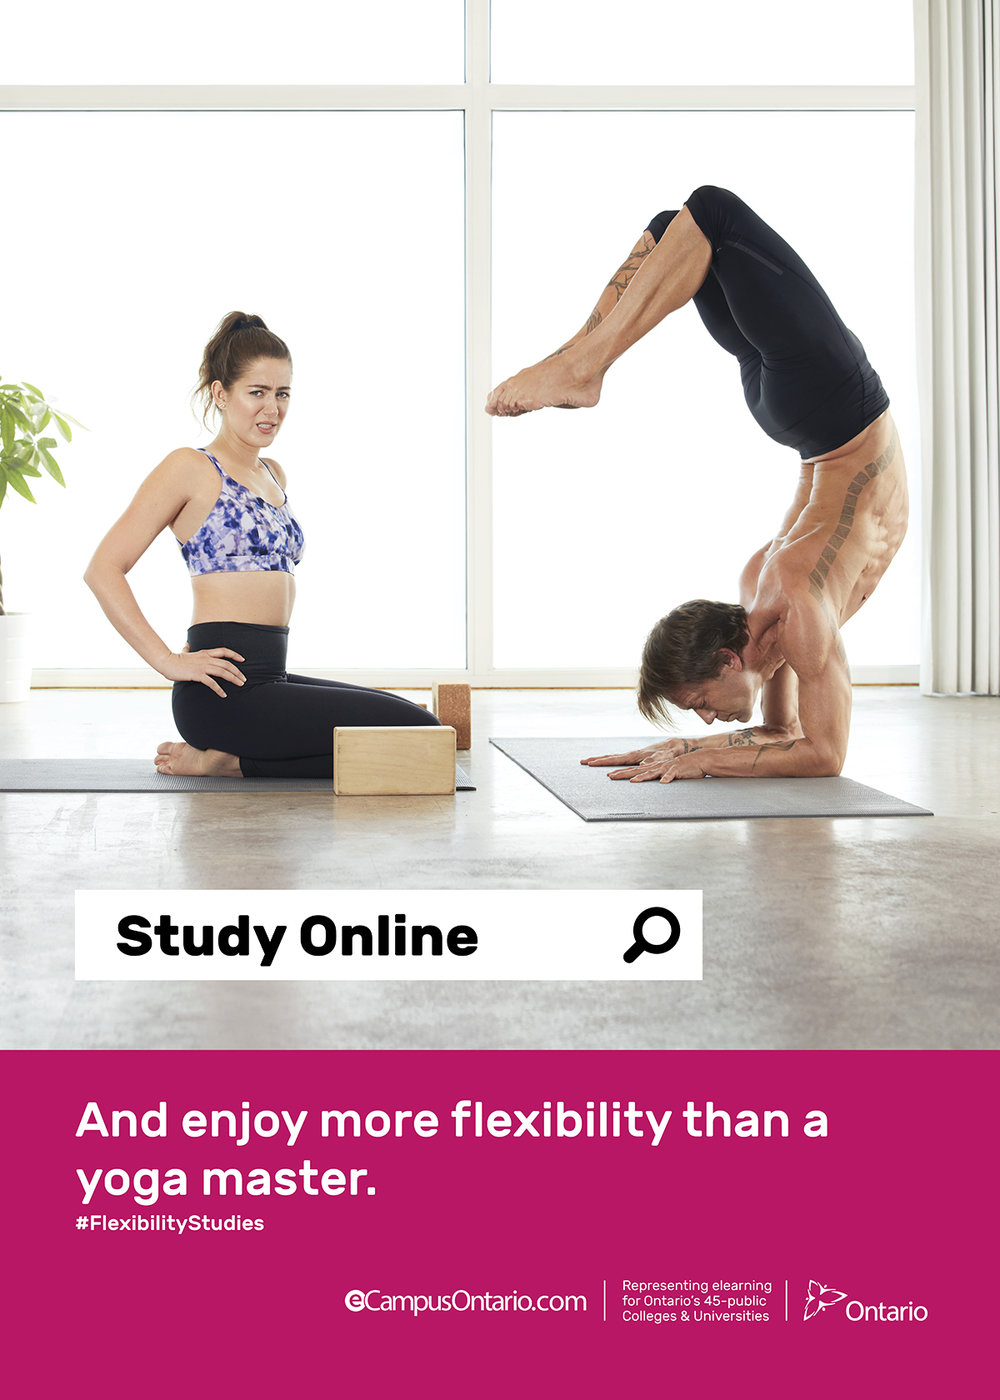 eCampus_Yoga_28x20_SubwayPoster2.jpg